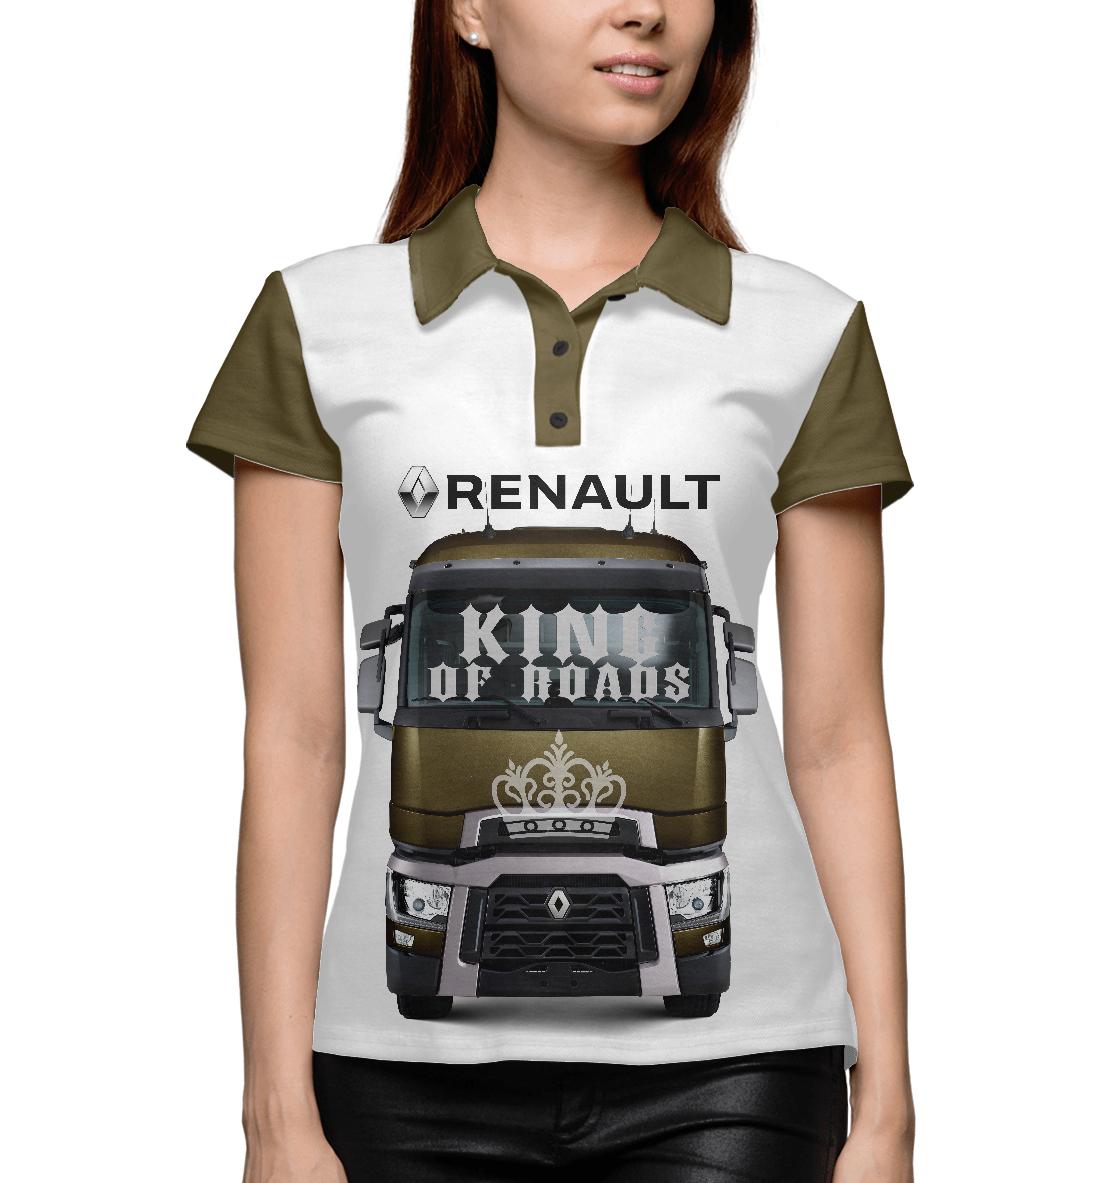 Купить RENAULT - король дорог, Printbar, Поло, GRZ-918078-pol-1